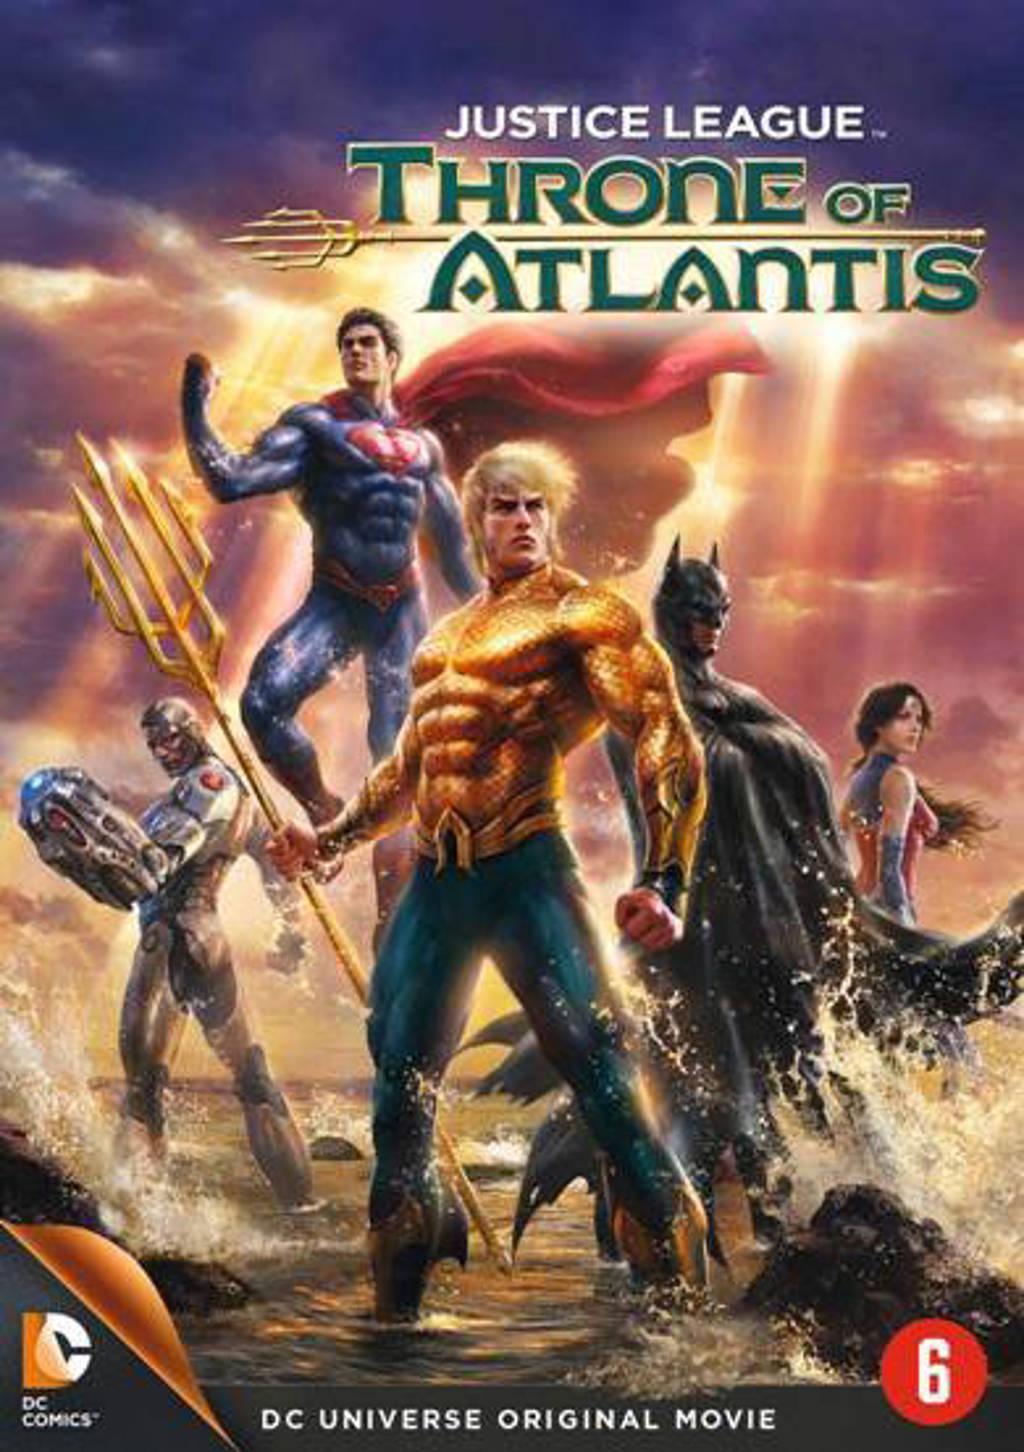 Justice league - Throne of Atlantis (DVD)